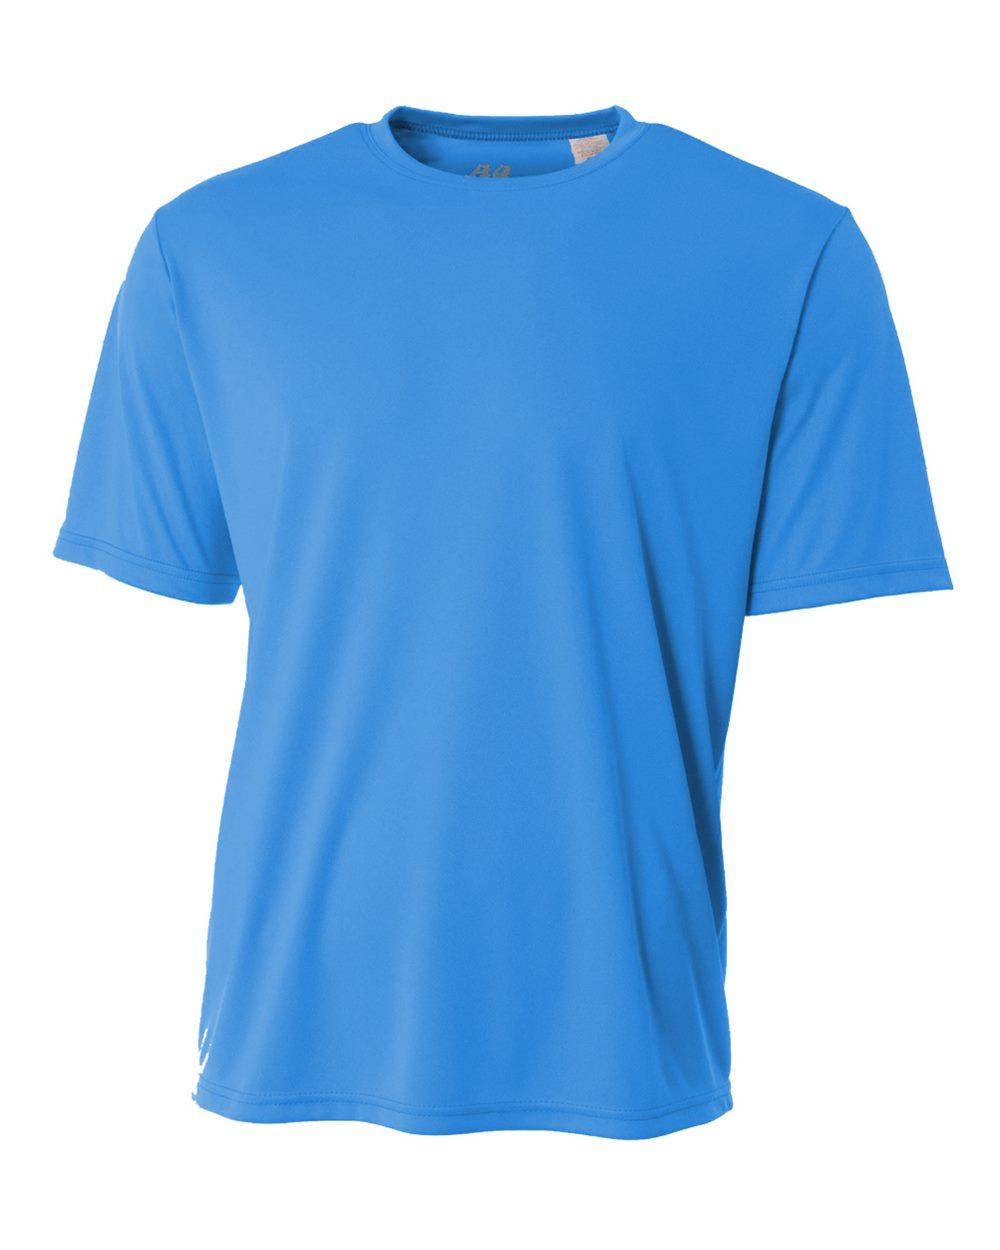 mw-polo-electric-blue.jpg